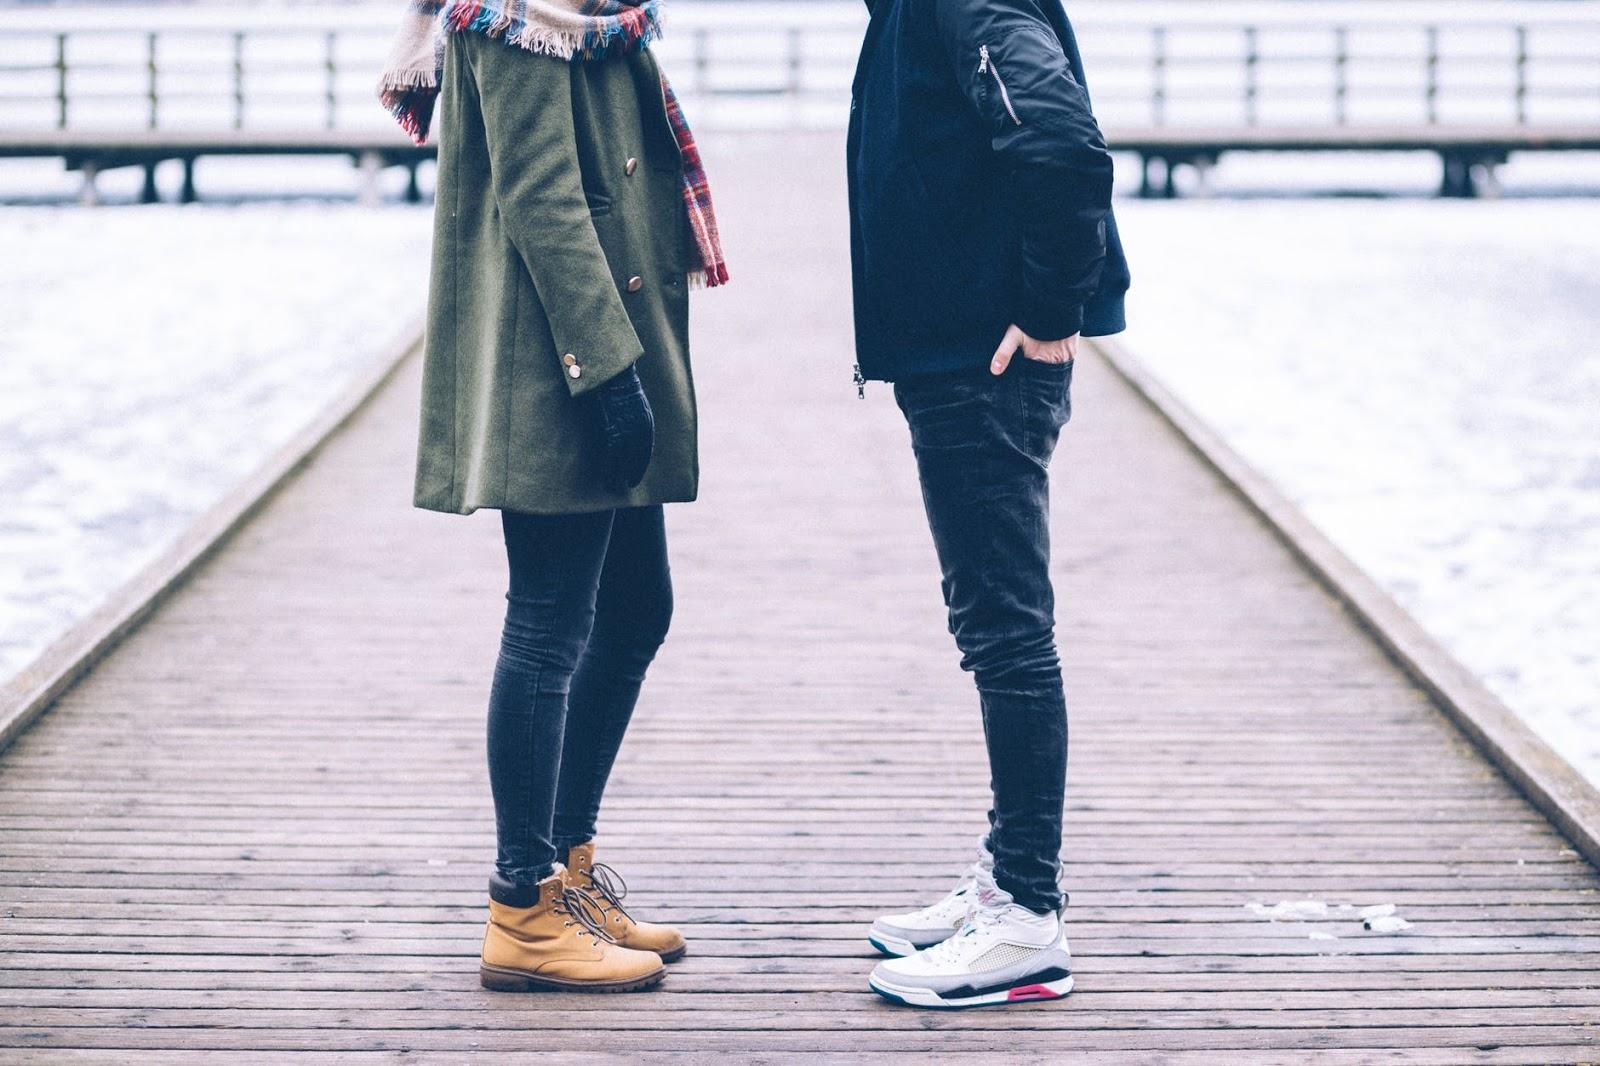 Kata Nembak Pacar Paling Romantis 72